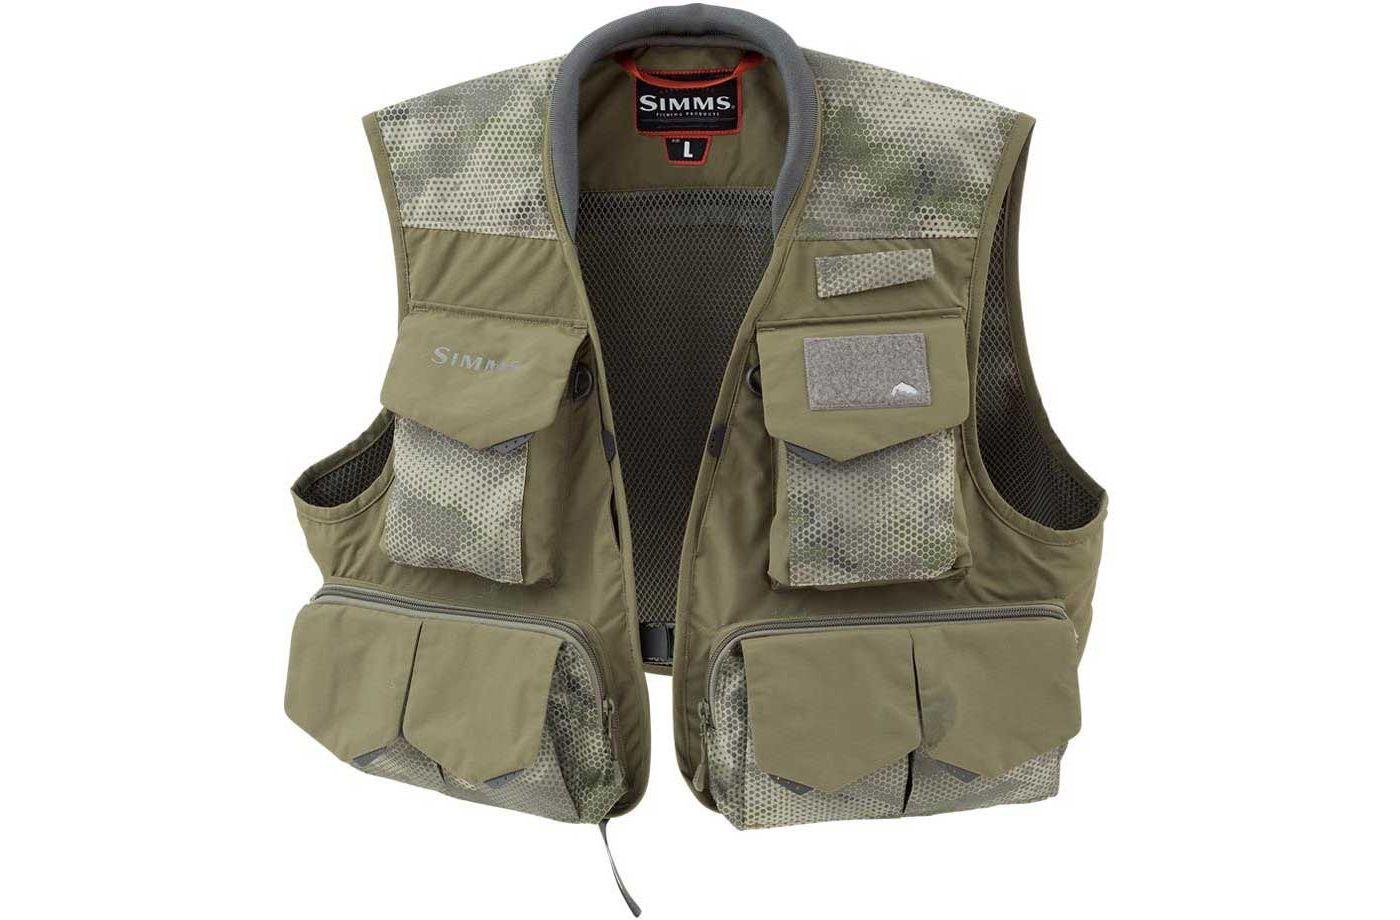 Simms Freestone Fishing Vest